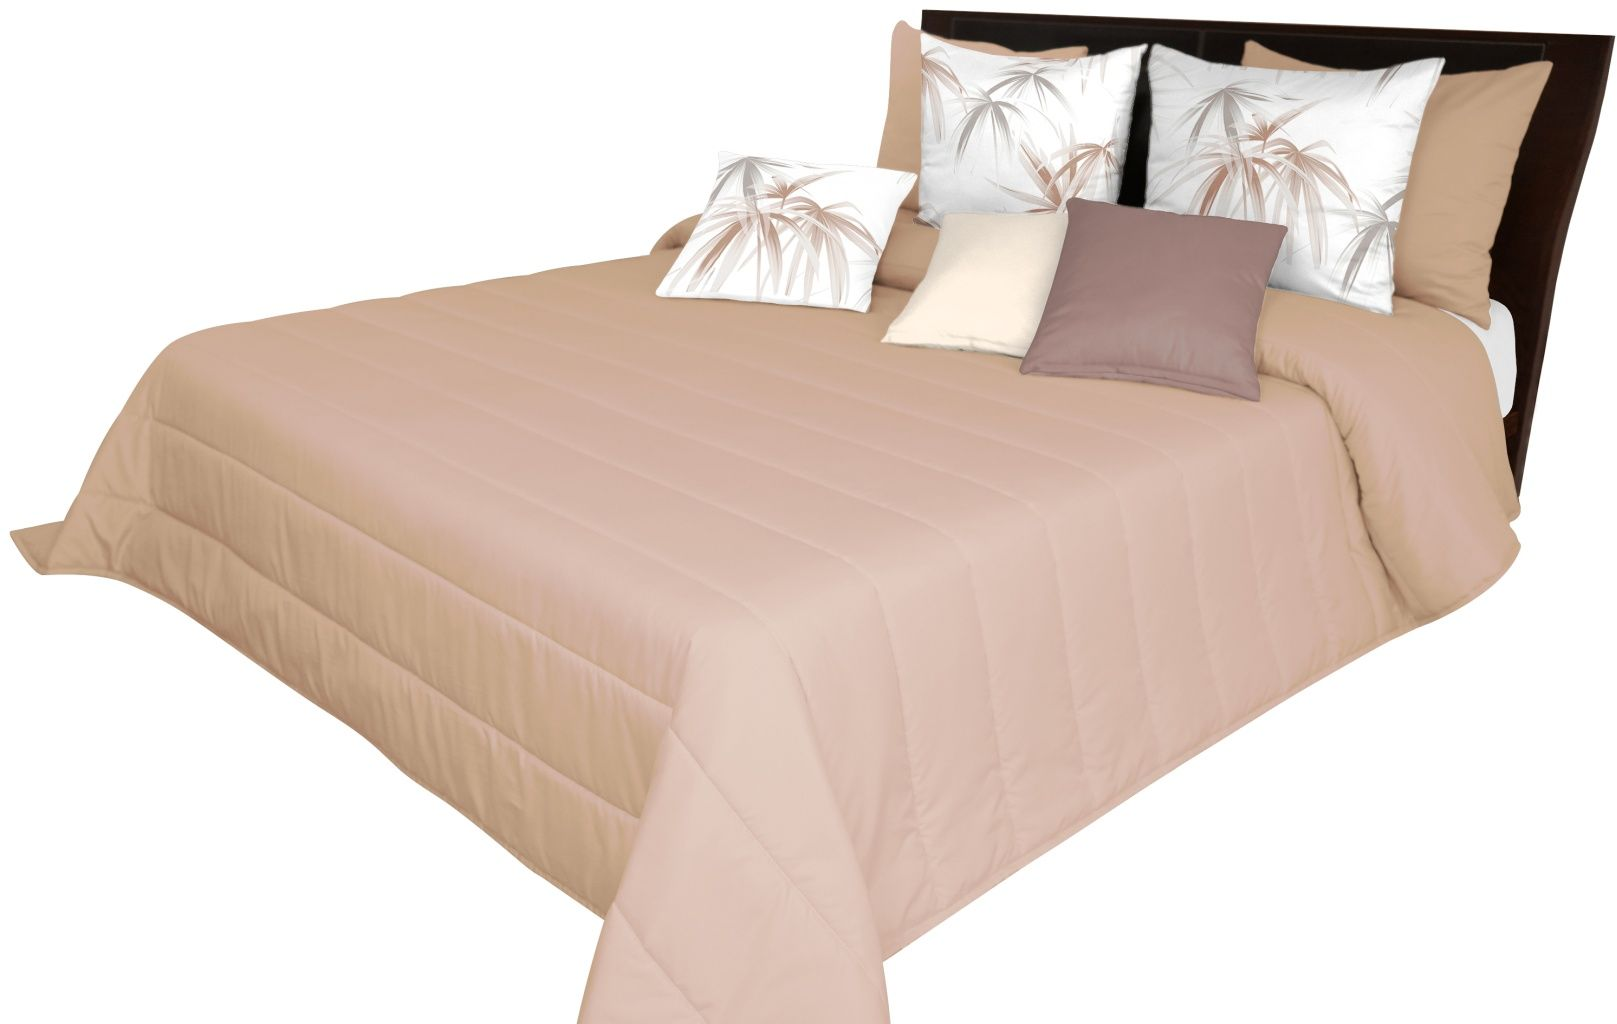 Narzuta pikowana na łóżko NMF-07 Mariall